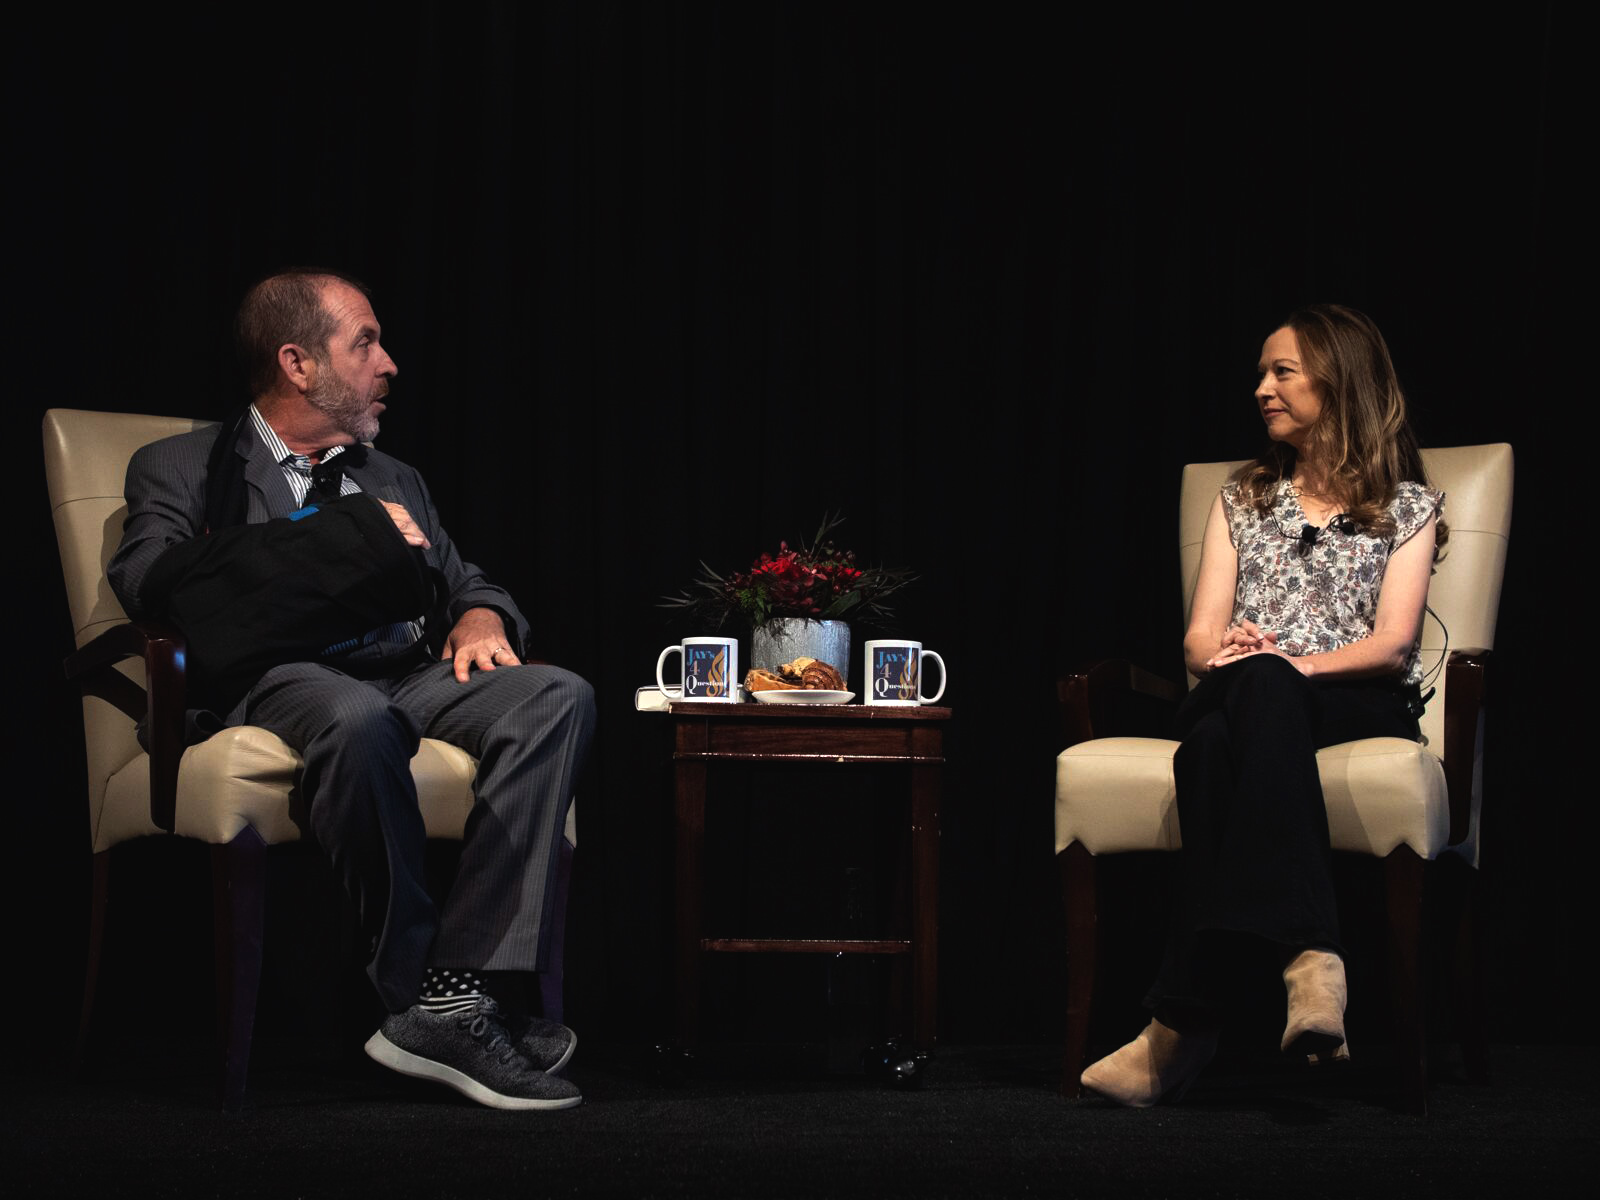 Lori Gottlieb and Jay Sanderson in deep conversation